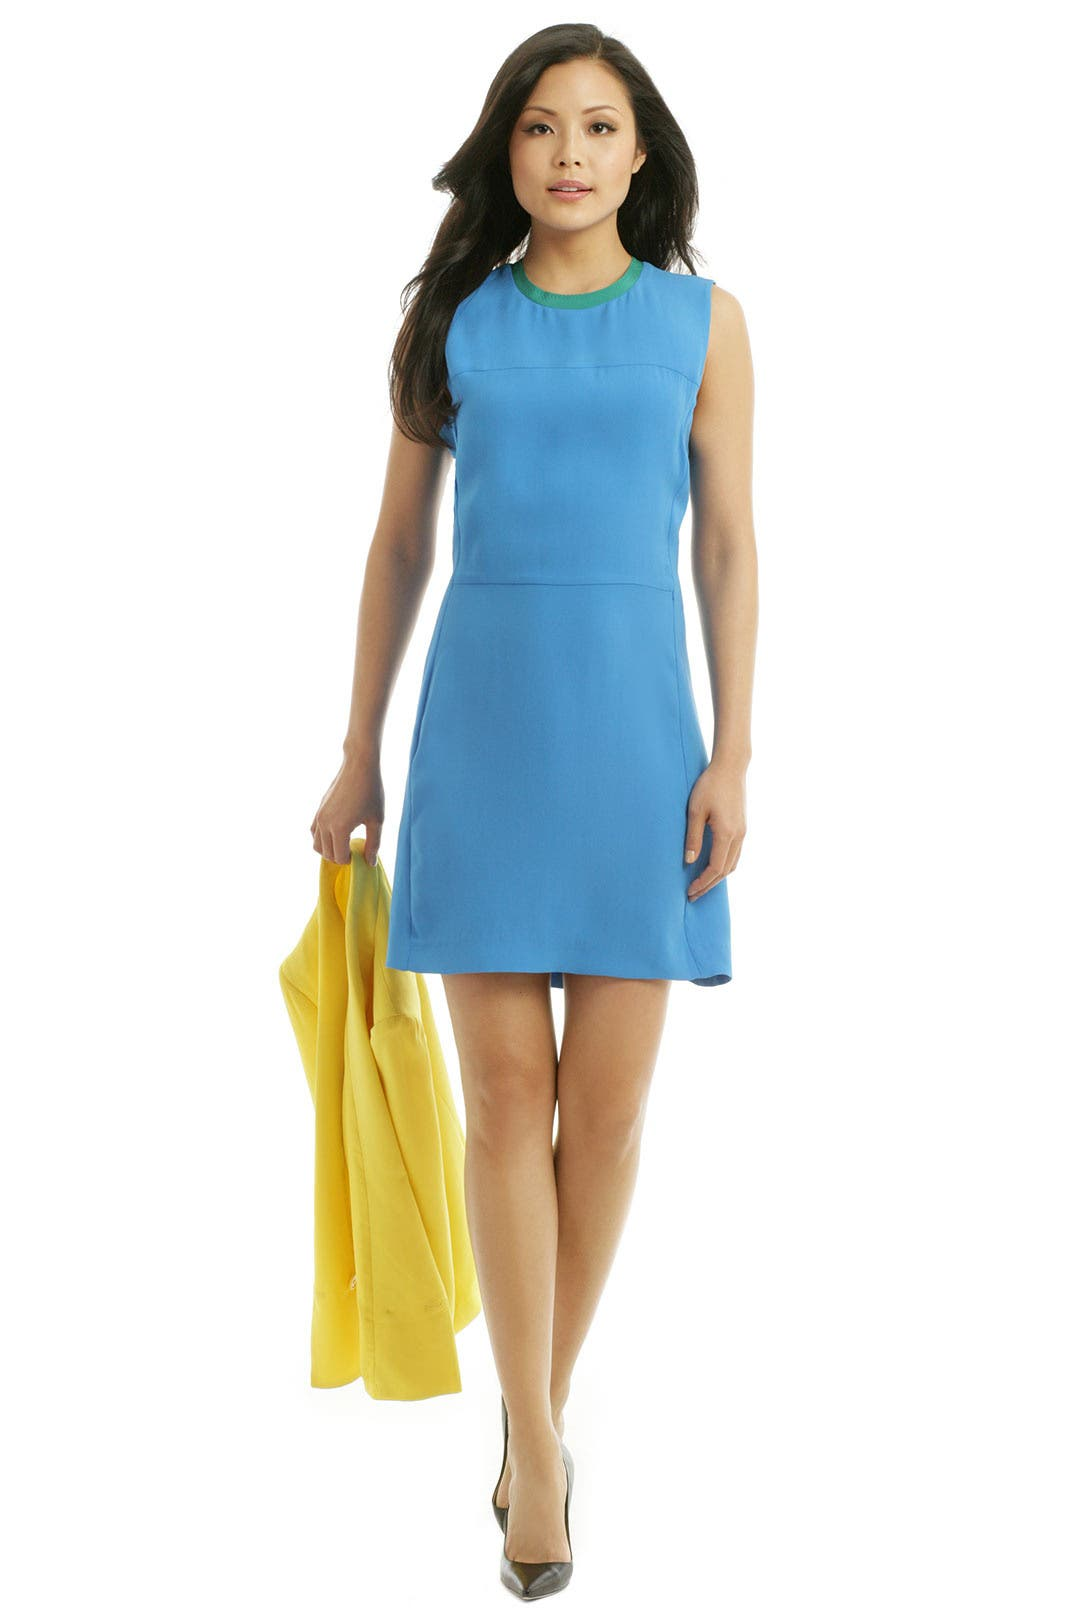 Patsy Contrast Dress by JOSEPH